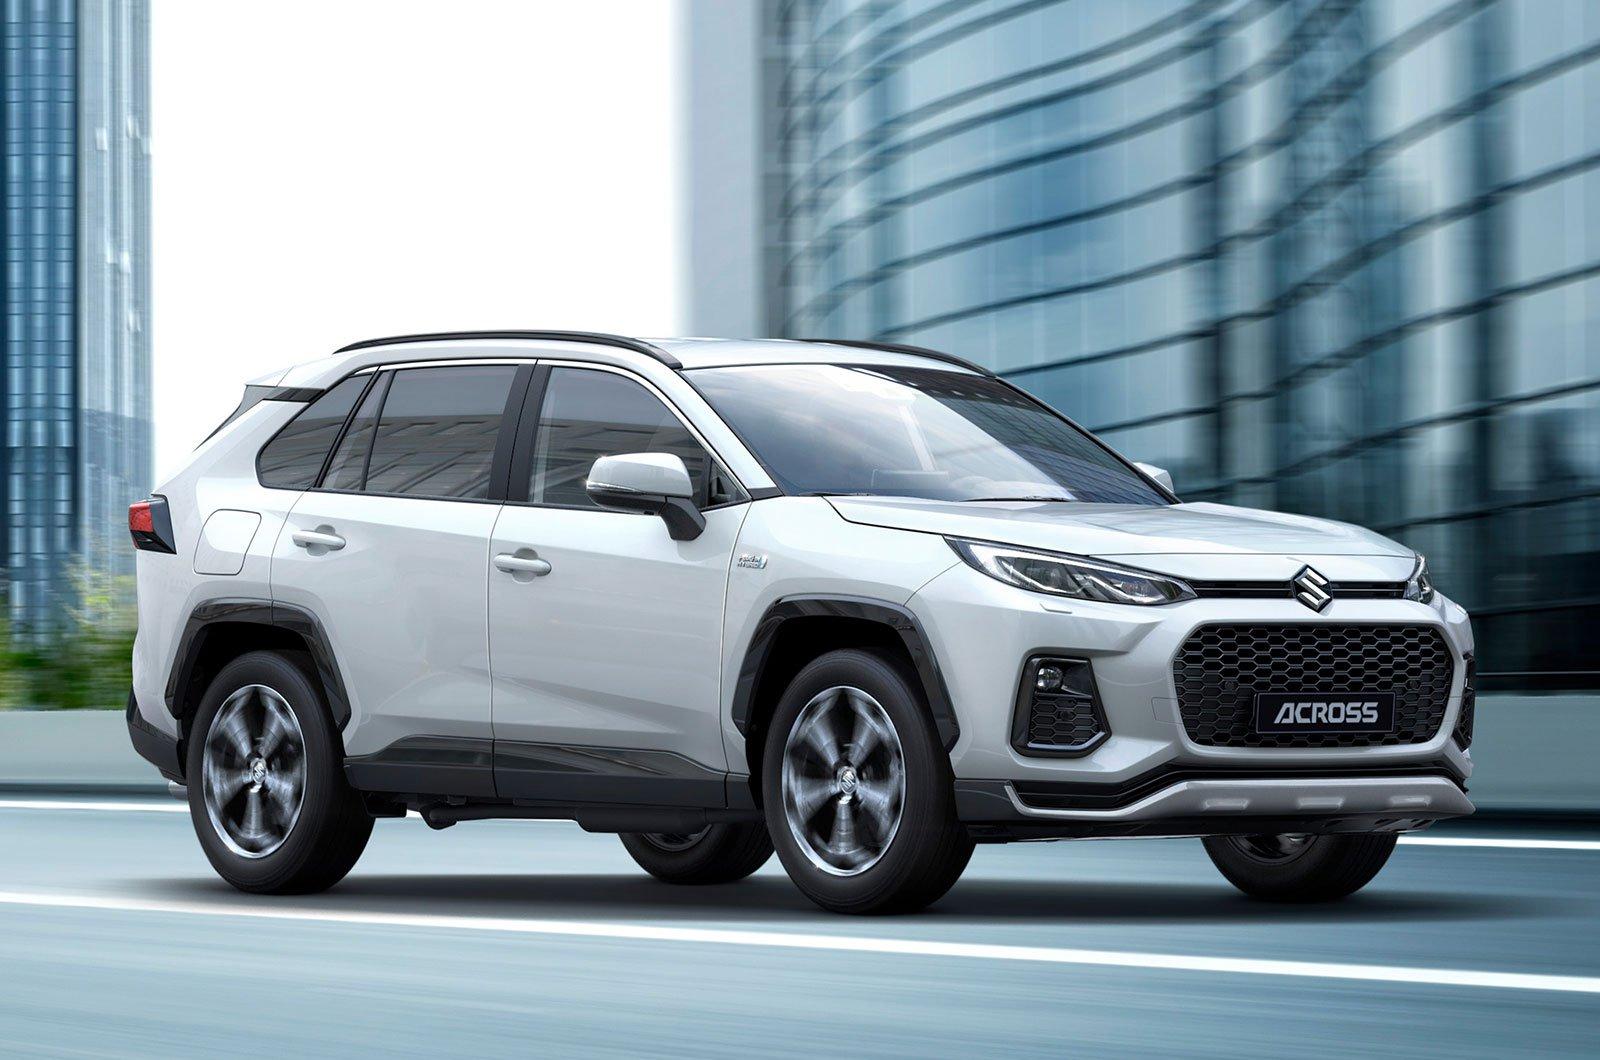 Suzuki Across front